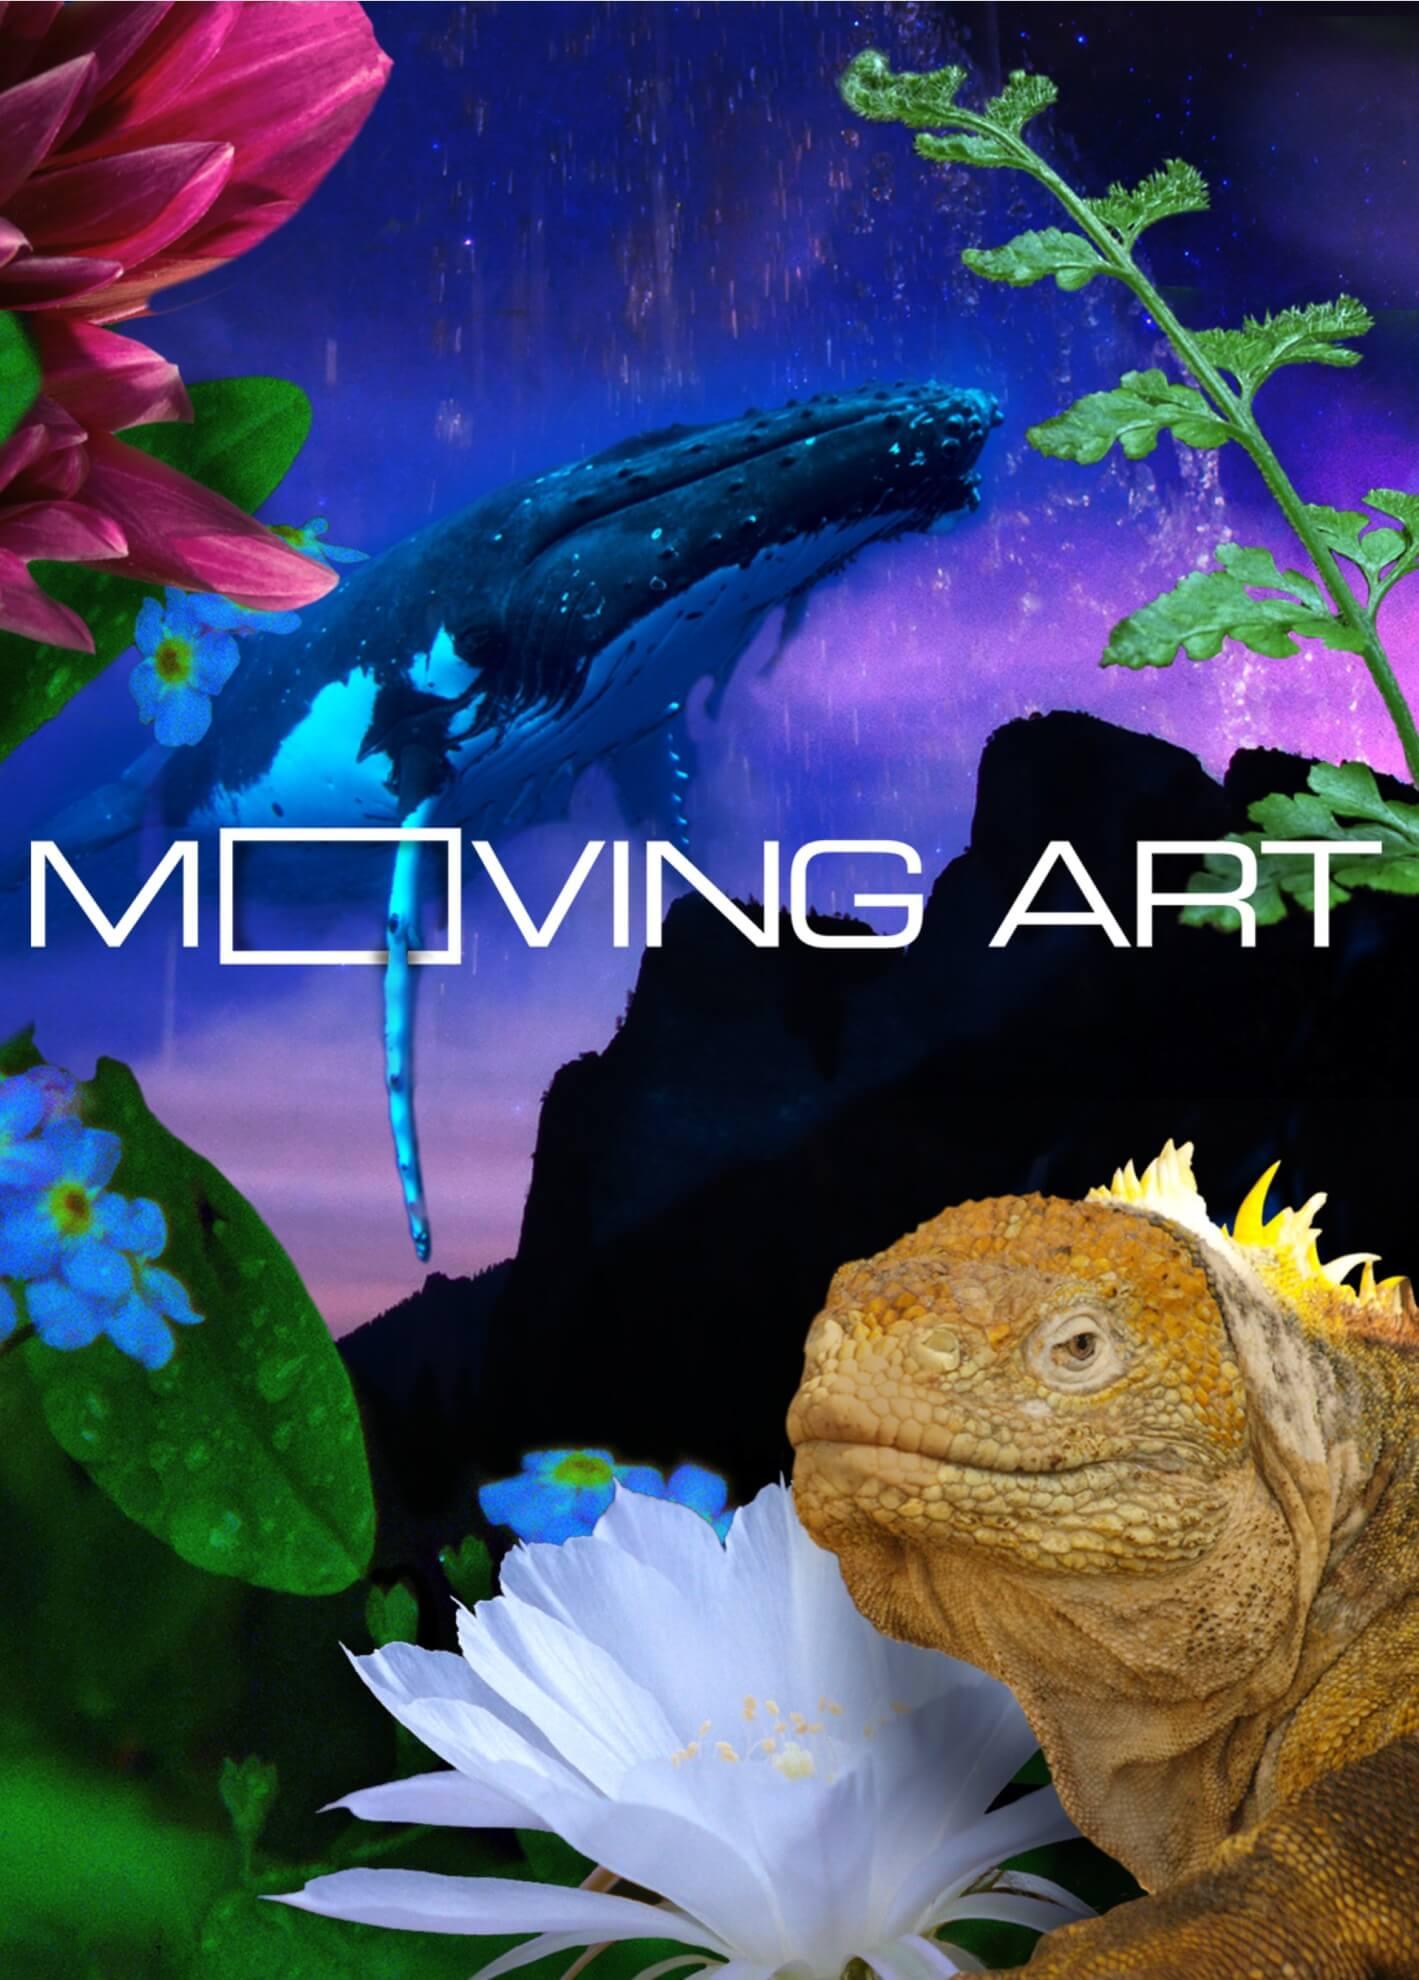 Moving Art Netflix Season 3